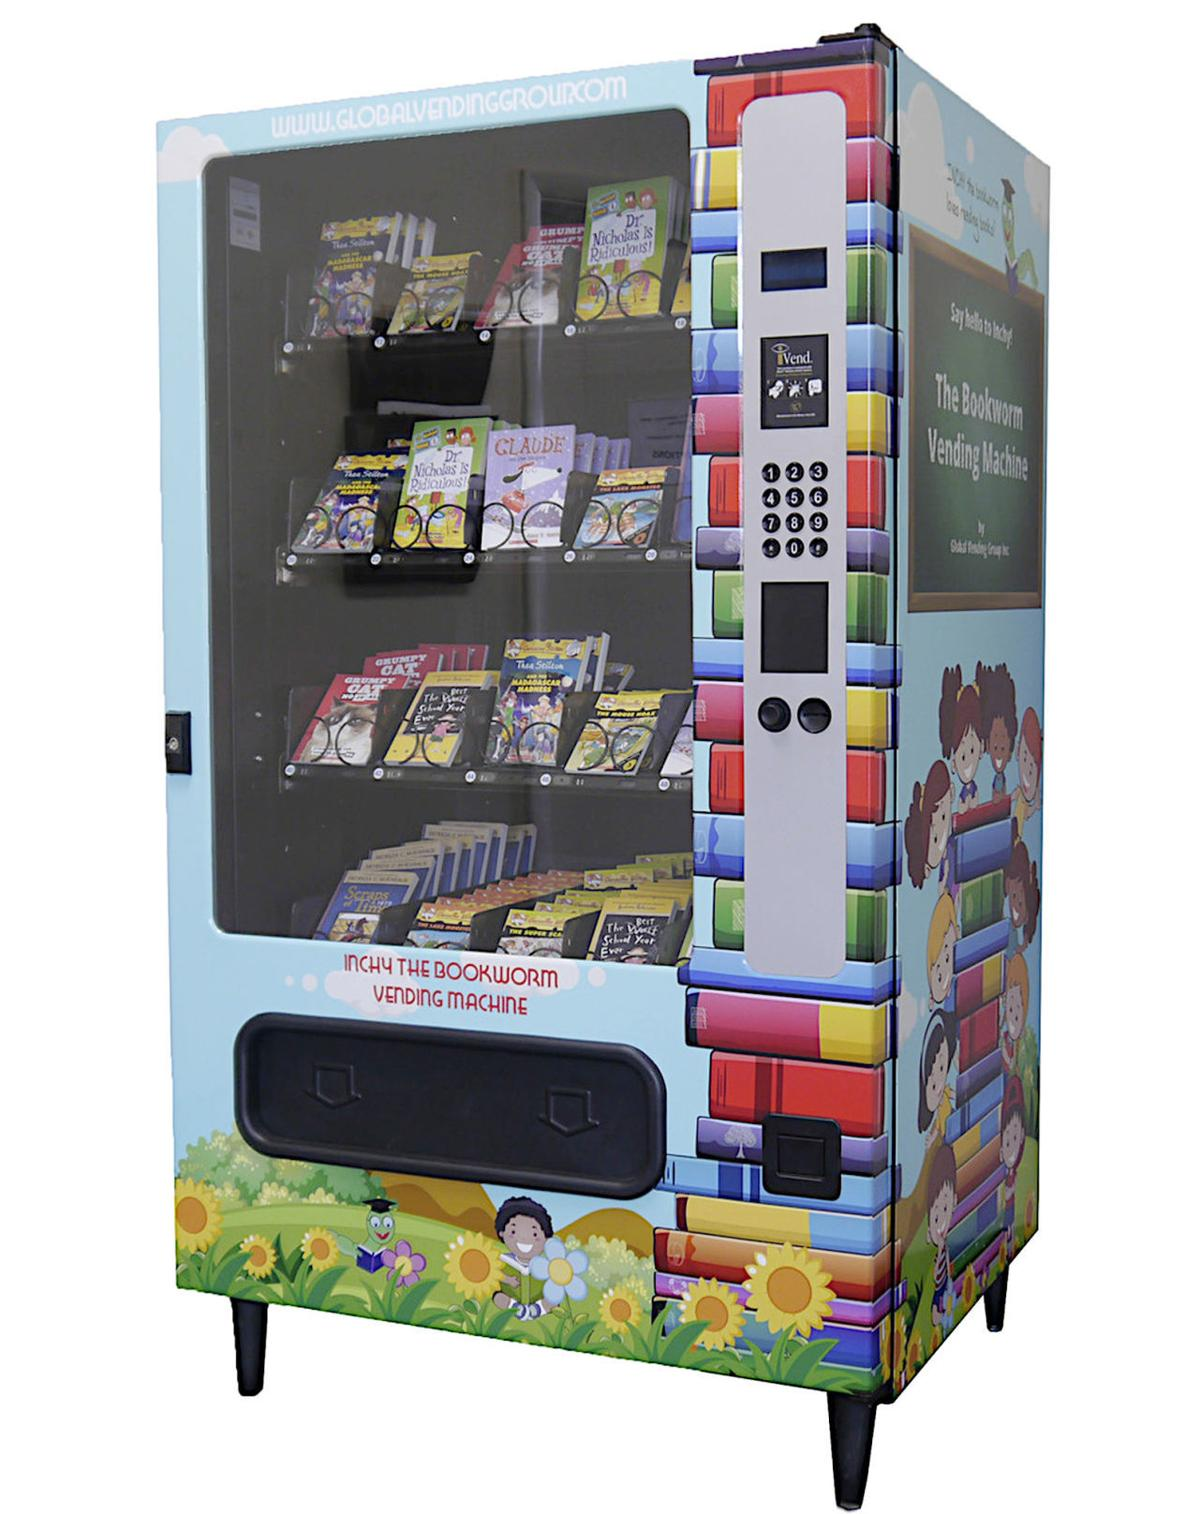 Inchy the Bookworm Book Vending Machine